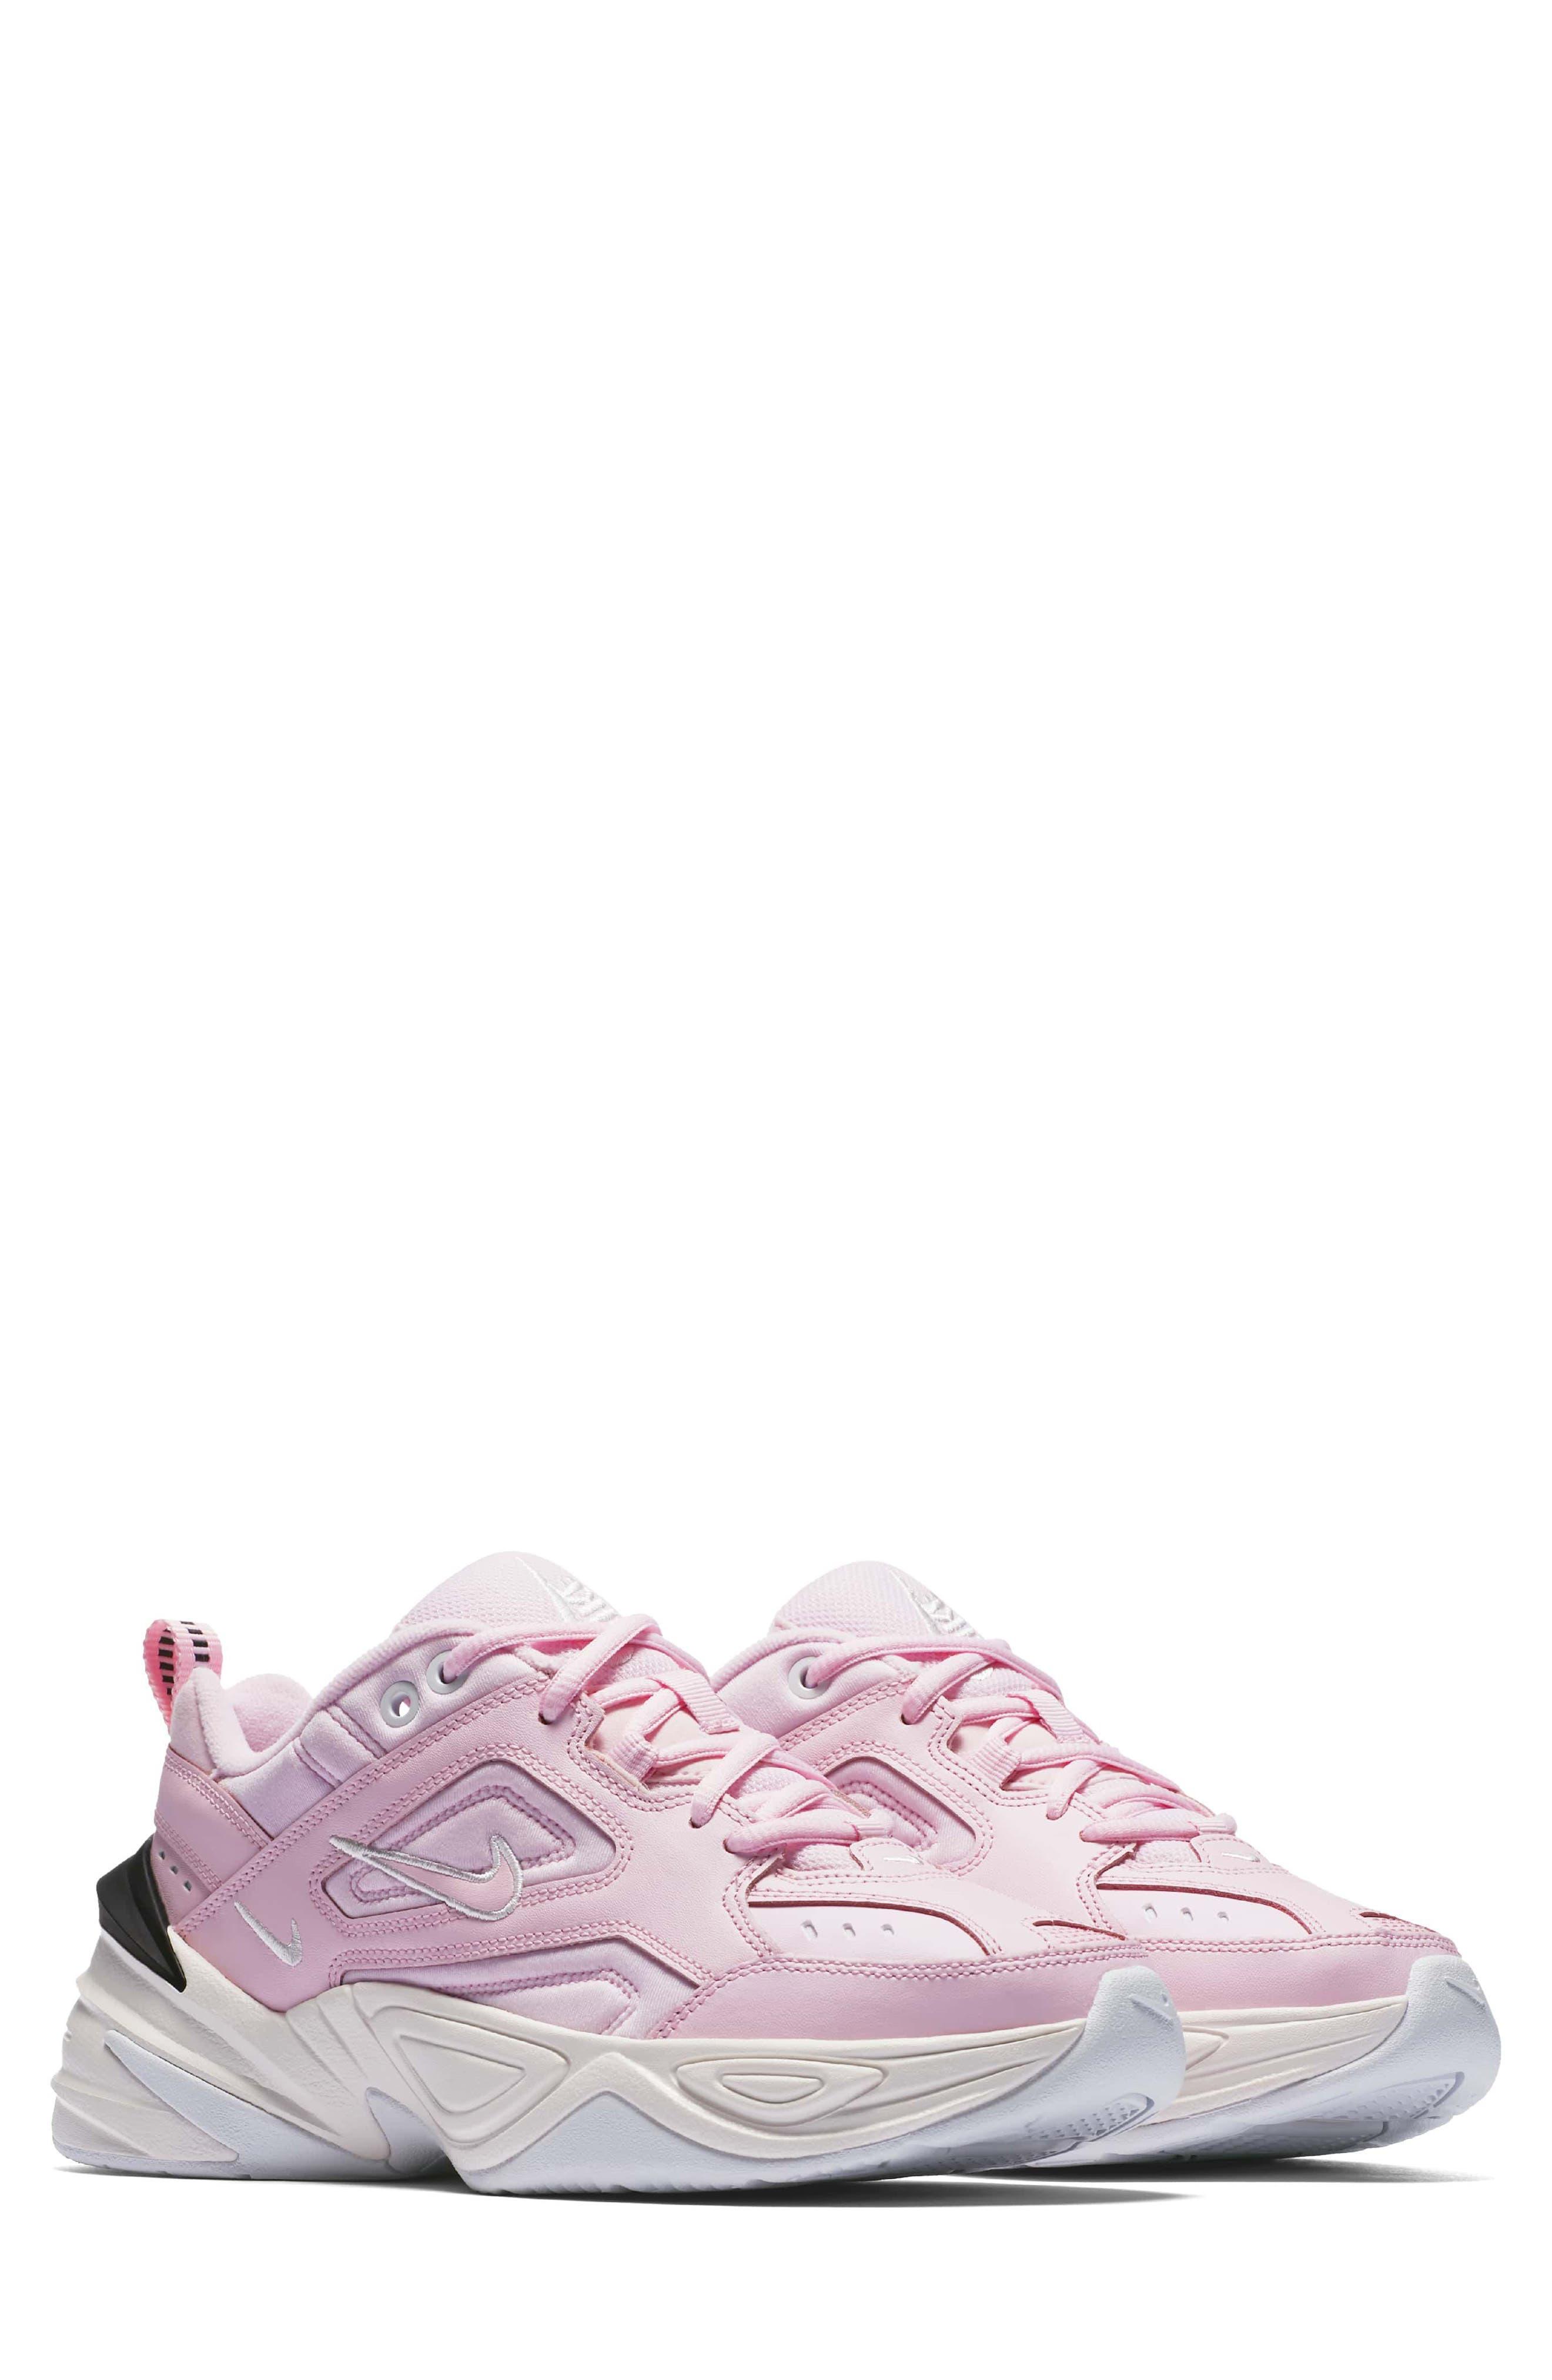 Main Image - Nike M2K Tekno Sneaker (Women)